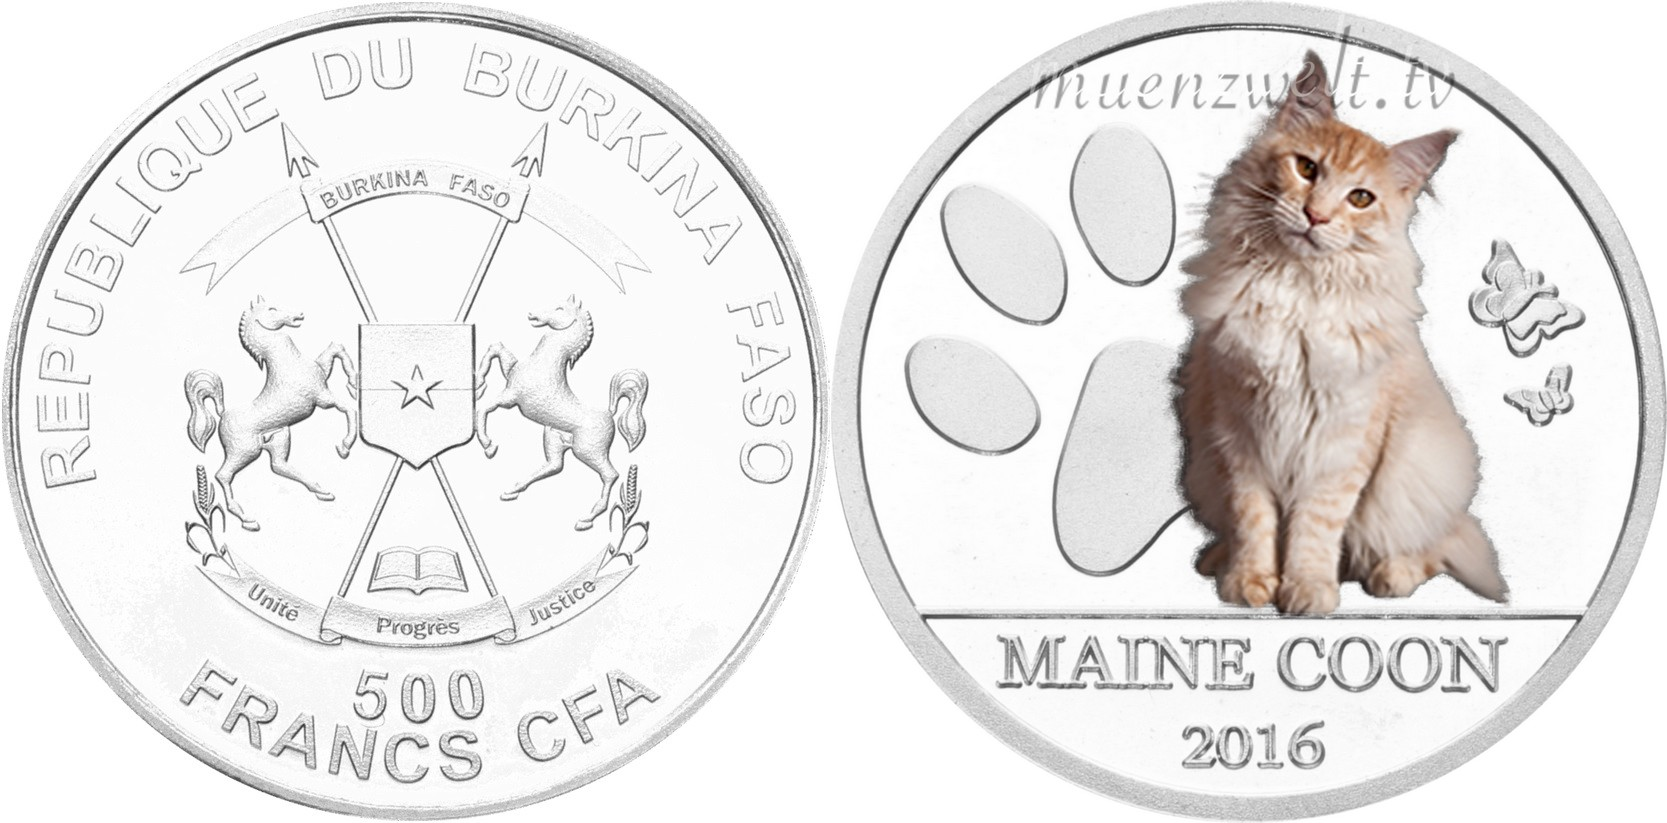 burkina faso 2016 chats du monde maine coon